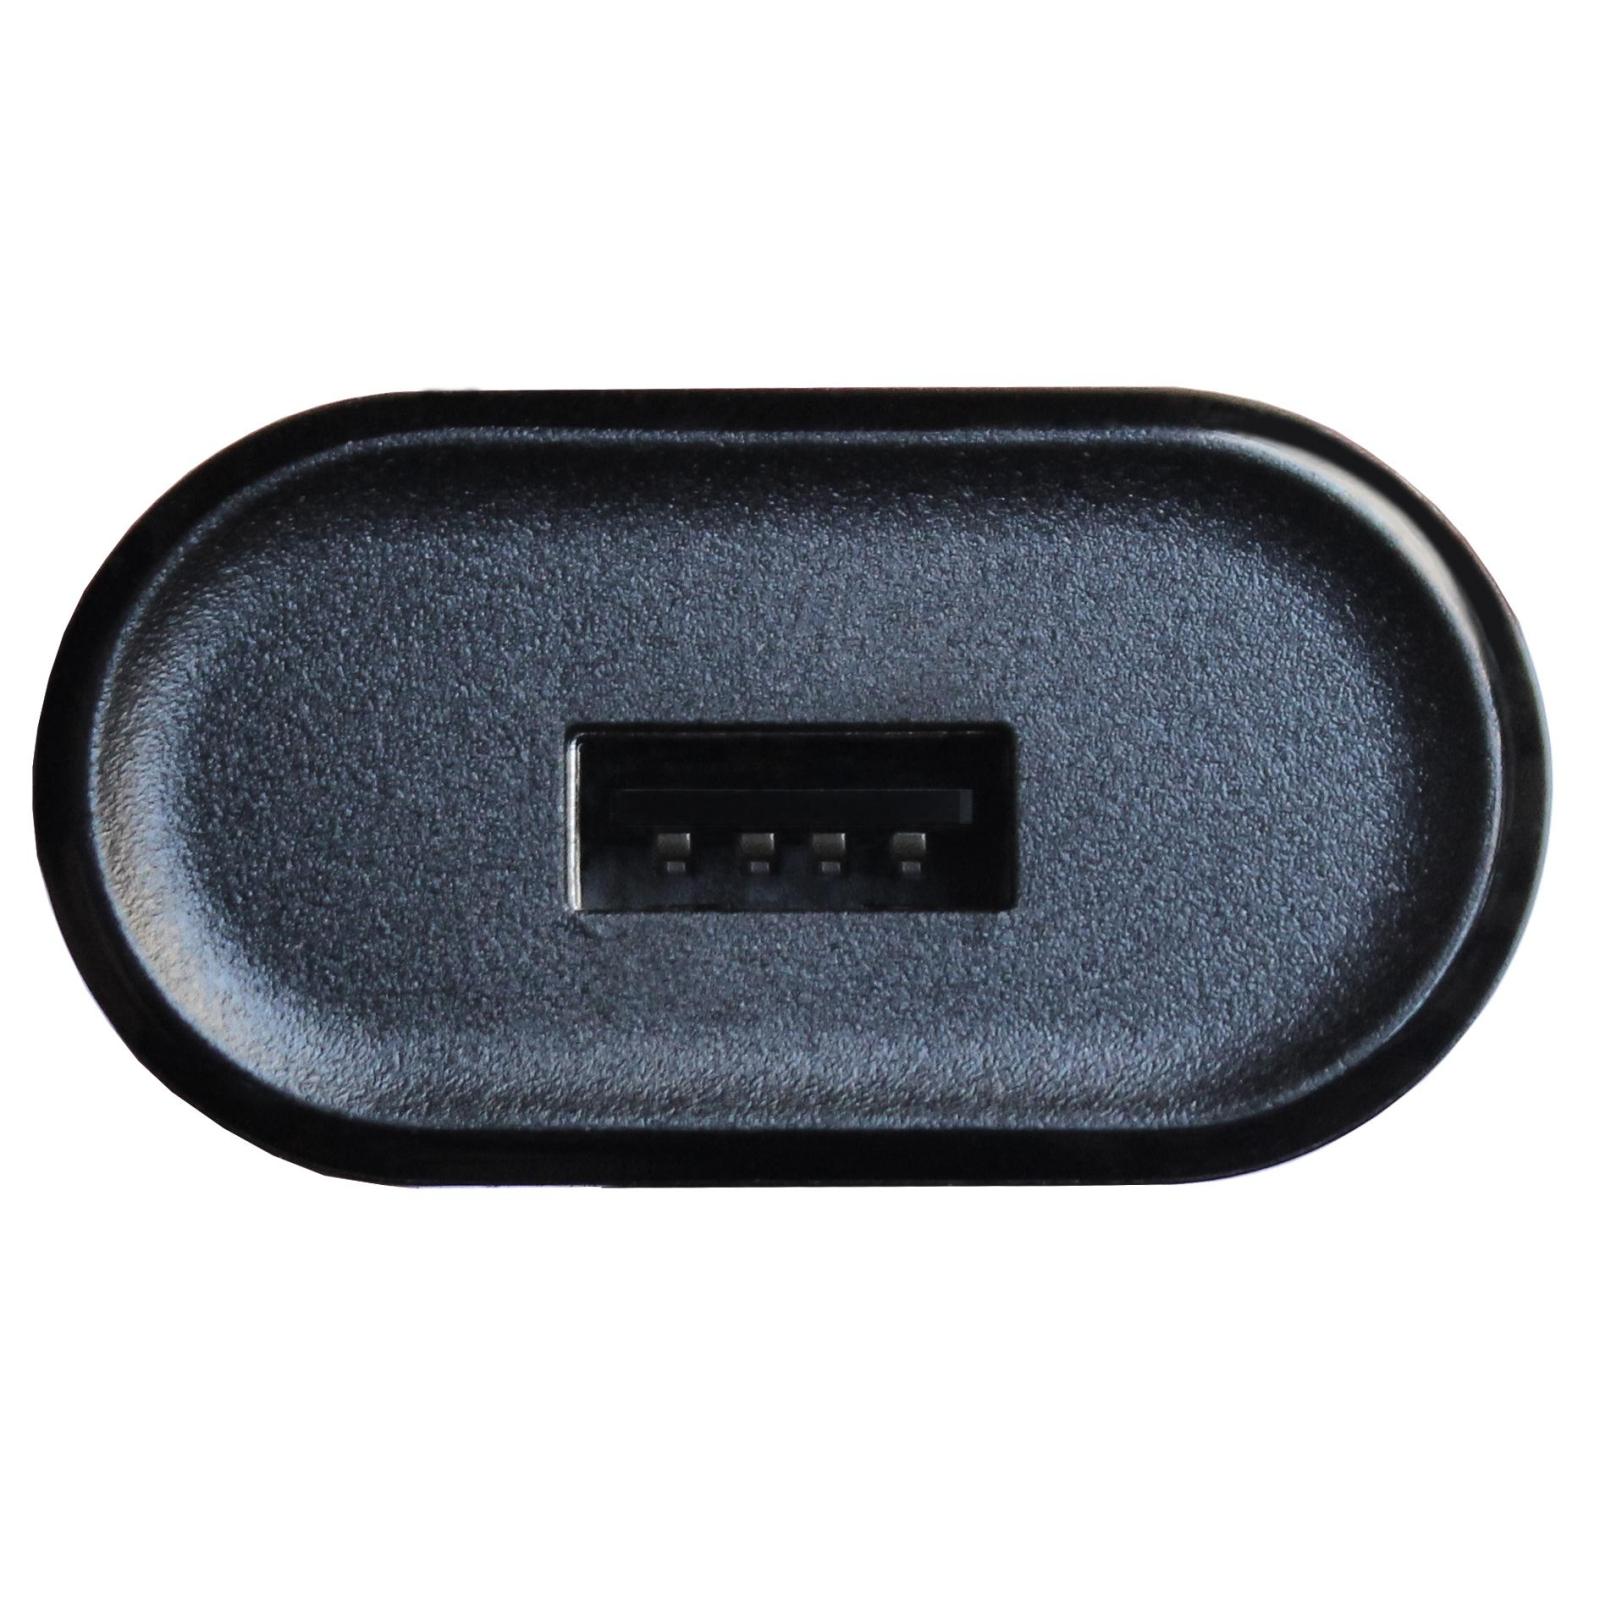 Зарядное устройство Grand-X 5V 2,4A 1*USB (CH-55B) изображение 4